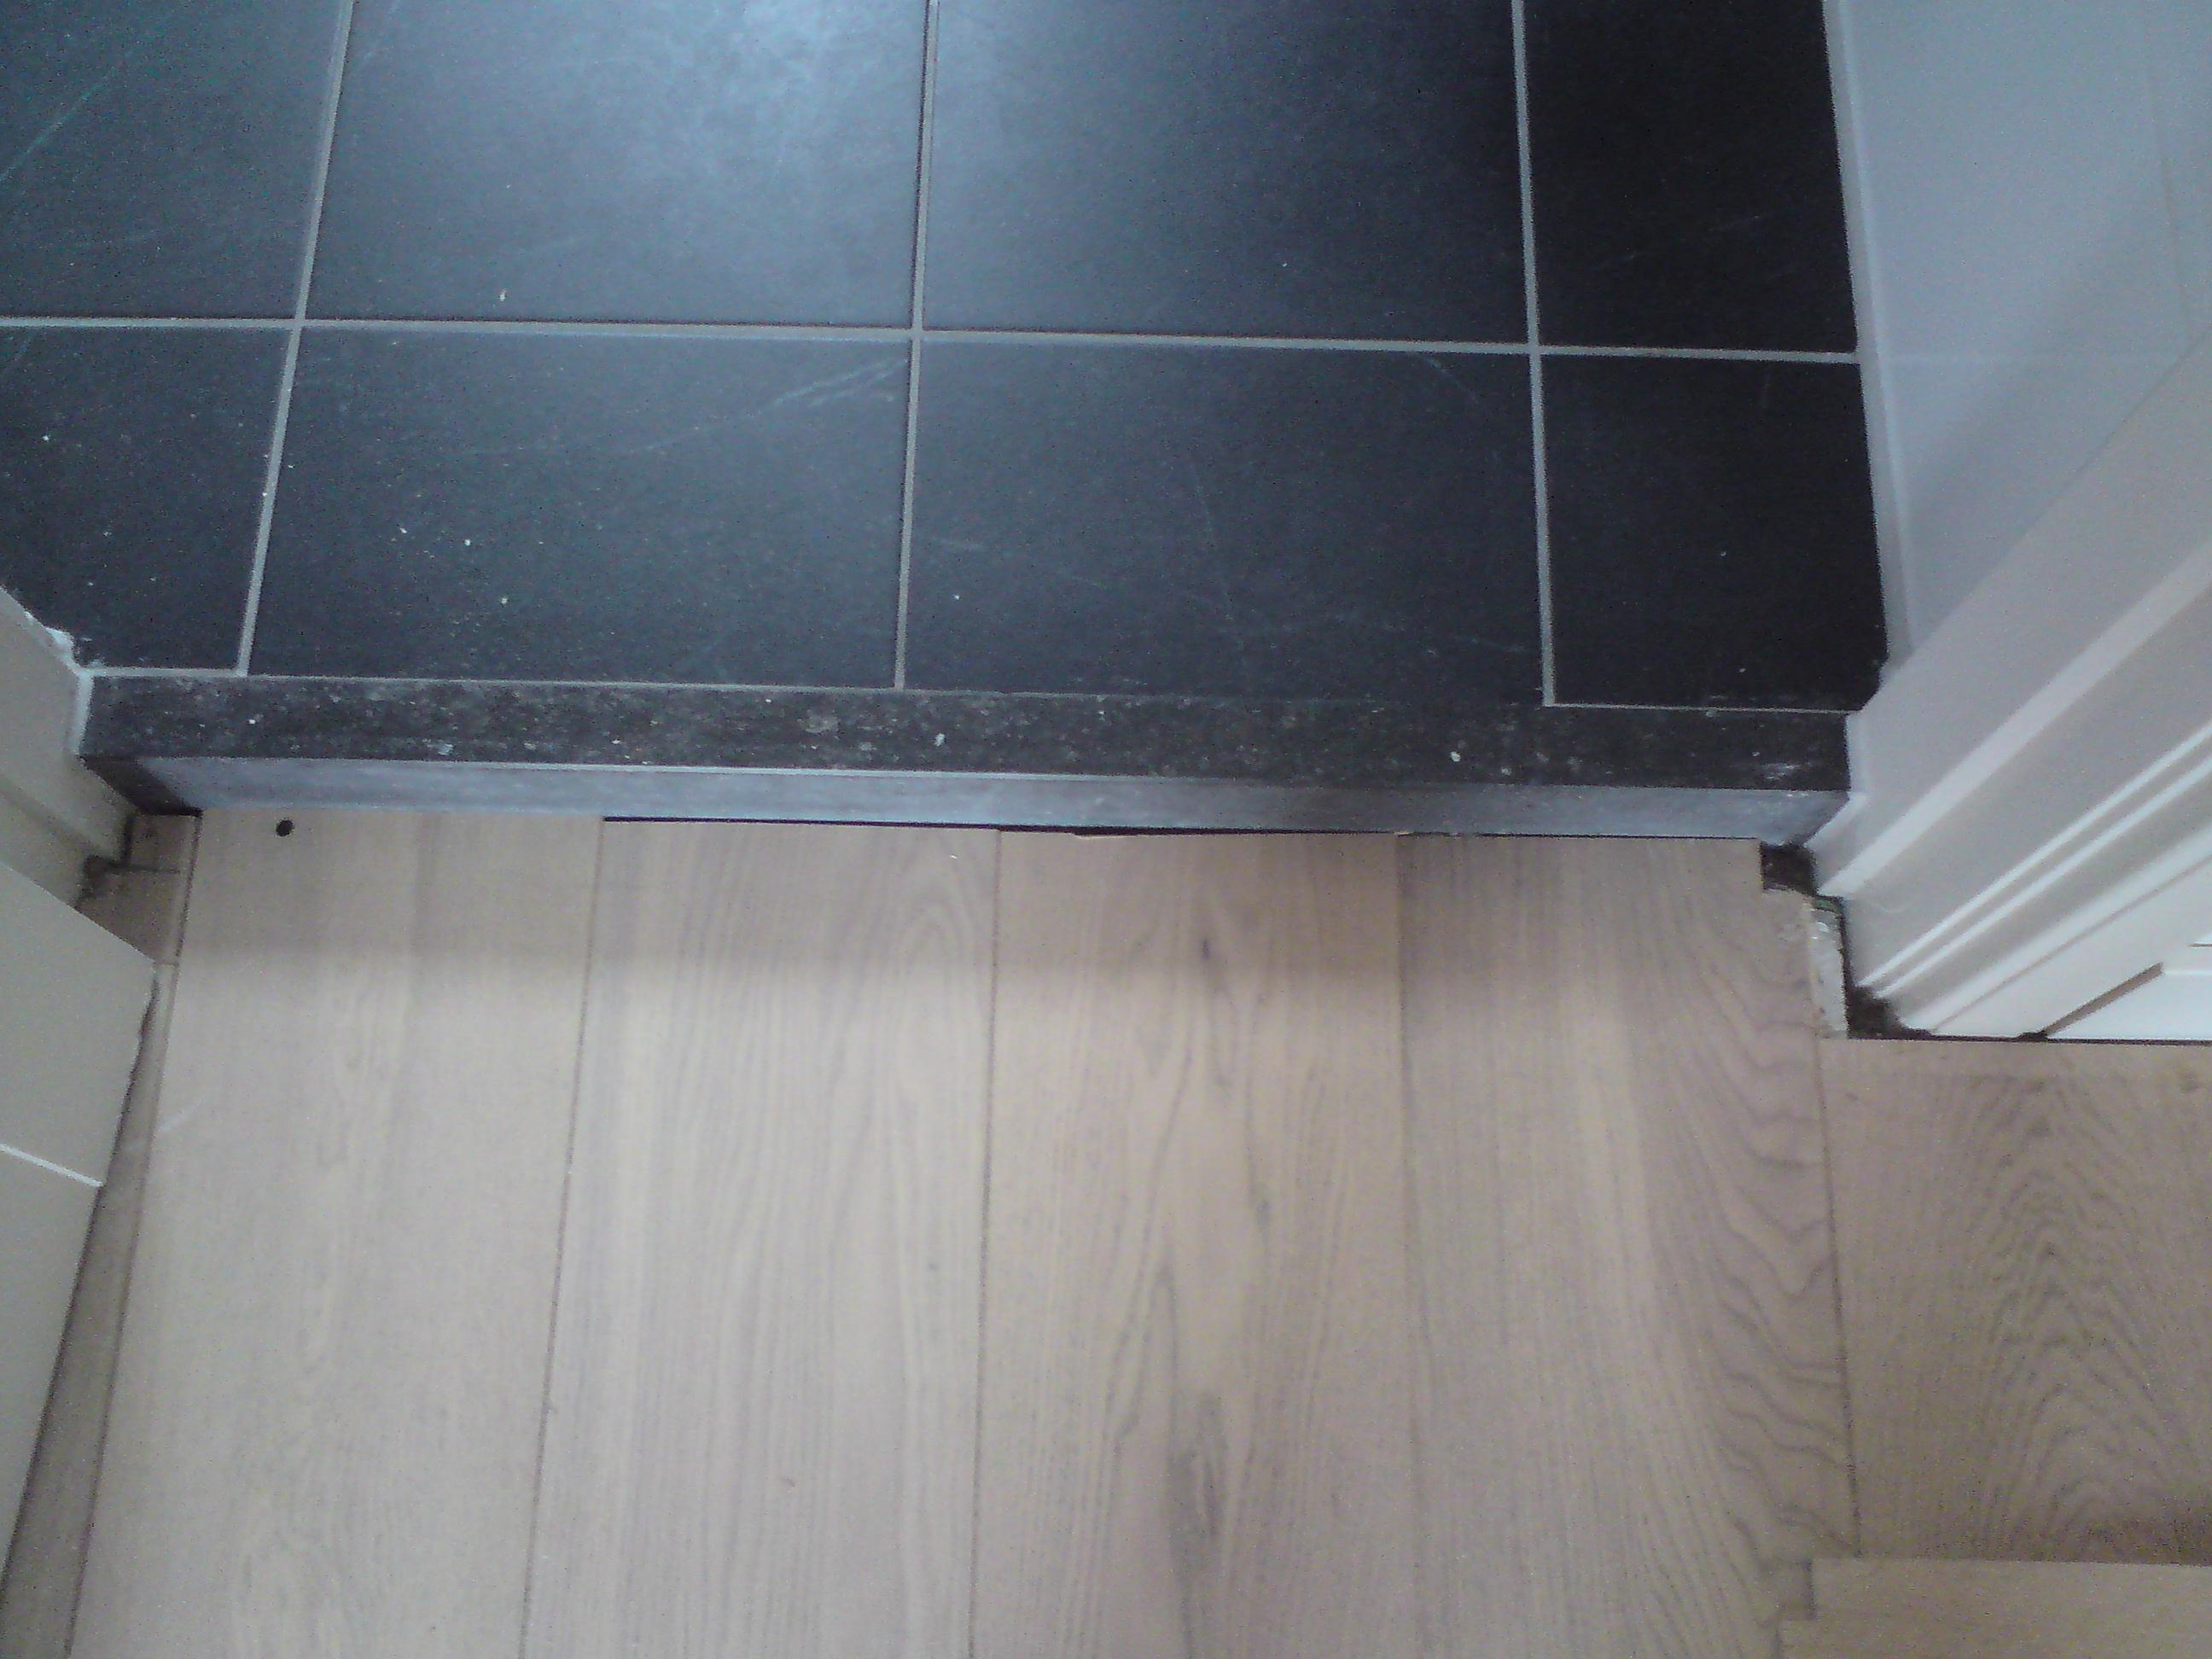 douche dorpel badkamer fuck for